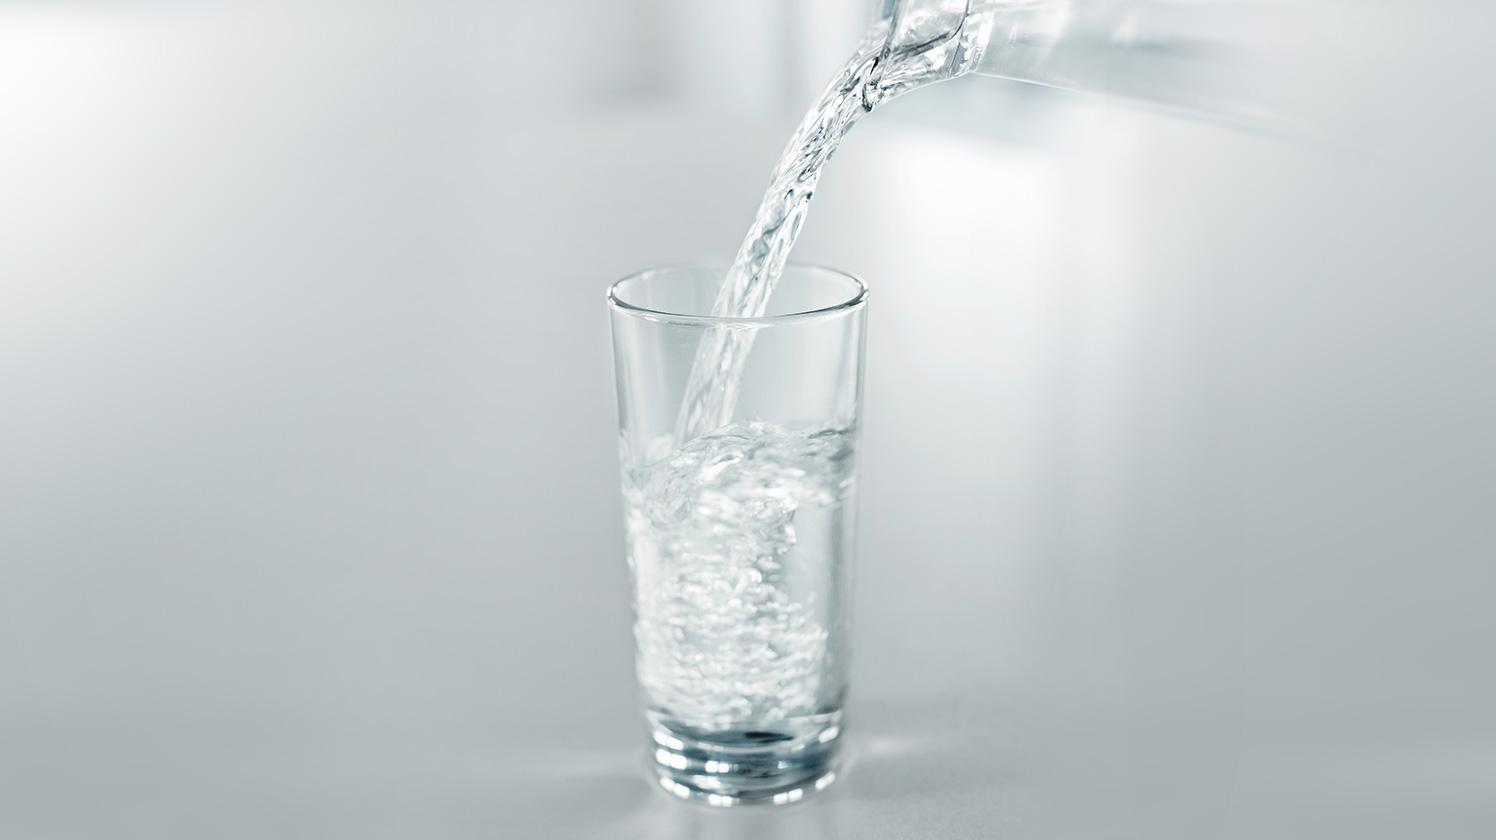 BRITA besoin hydratation perso remplir verre d'eau